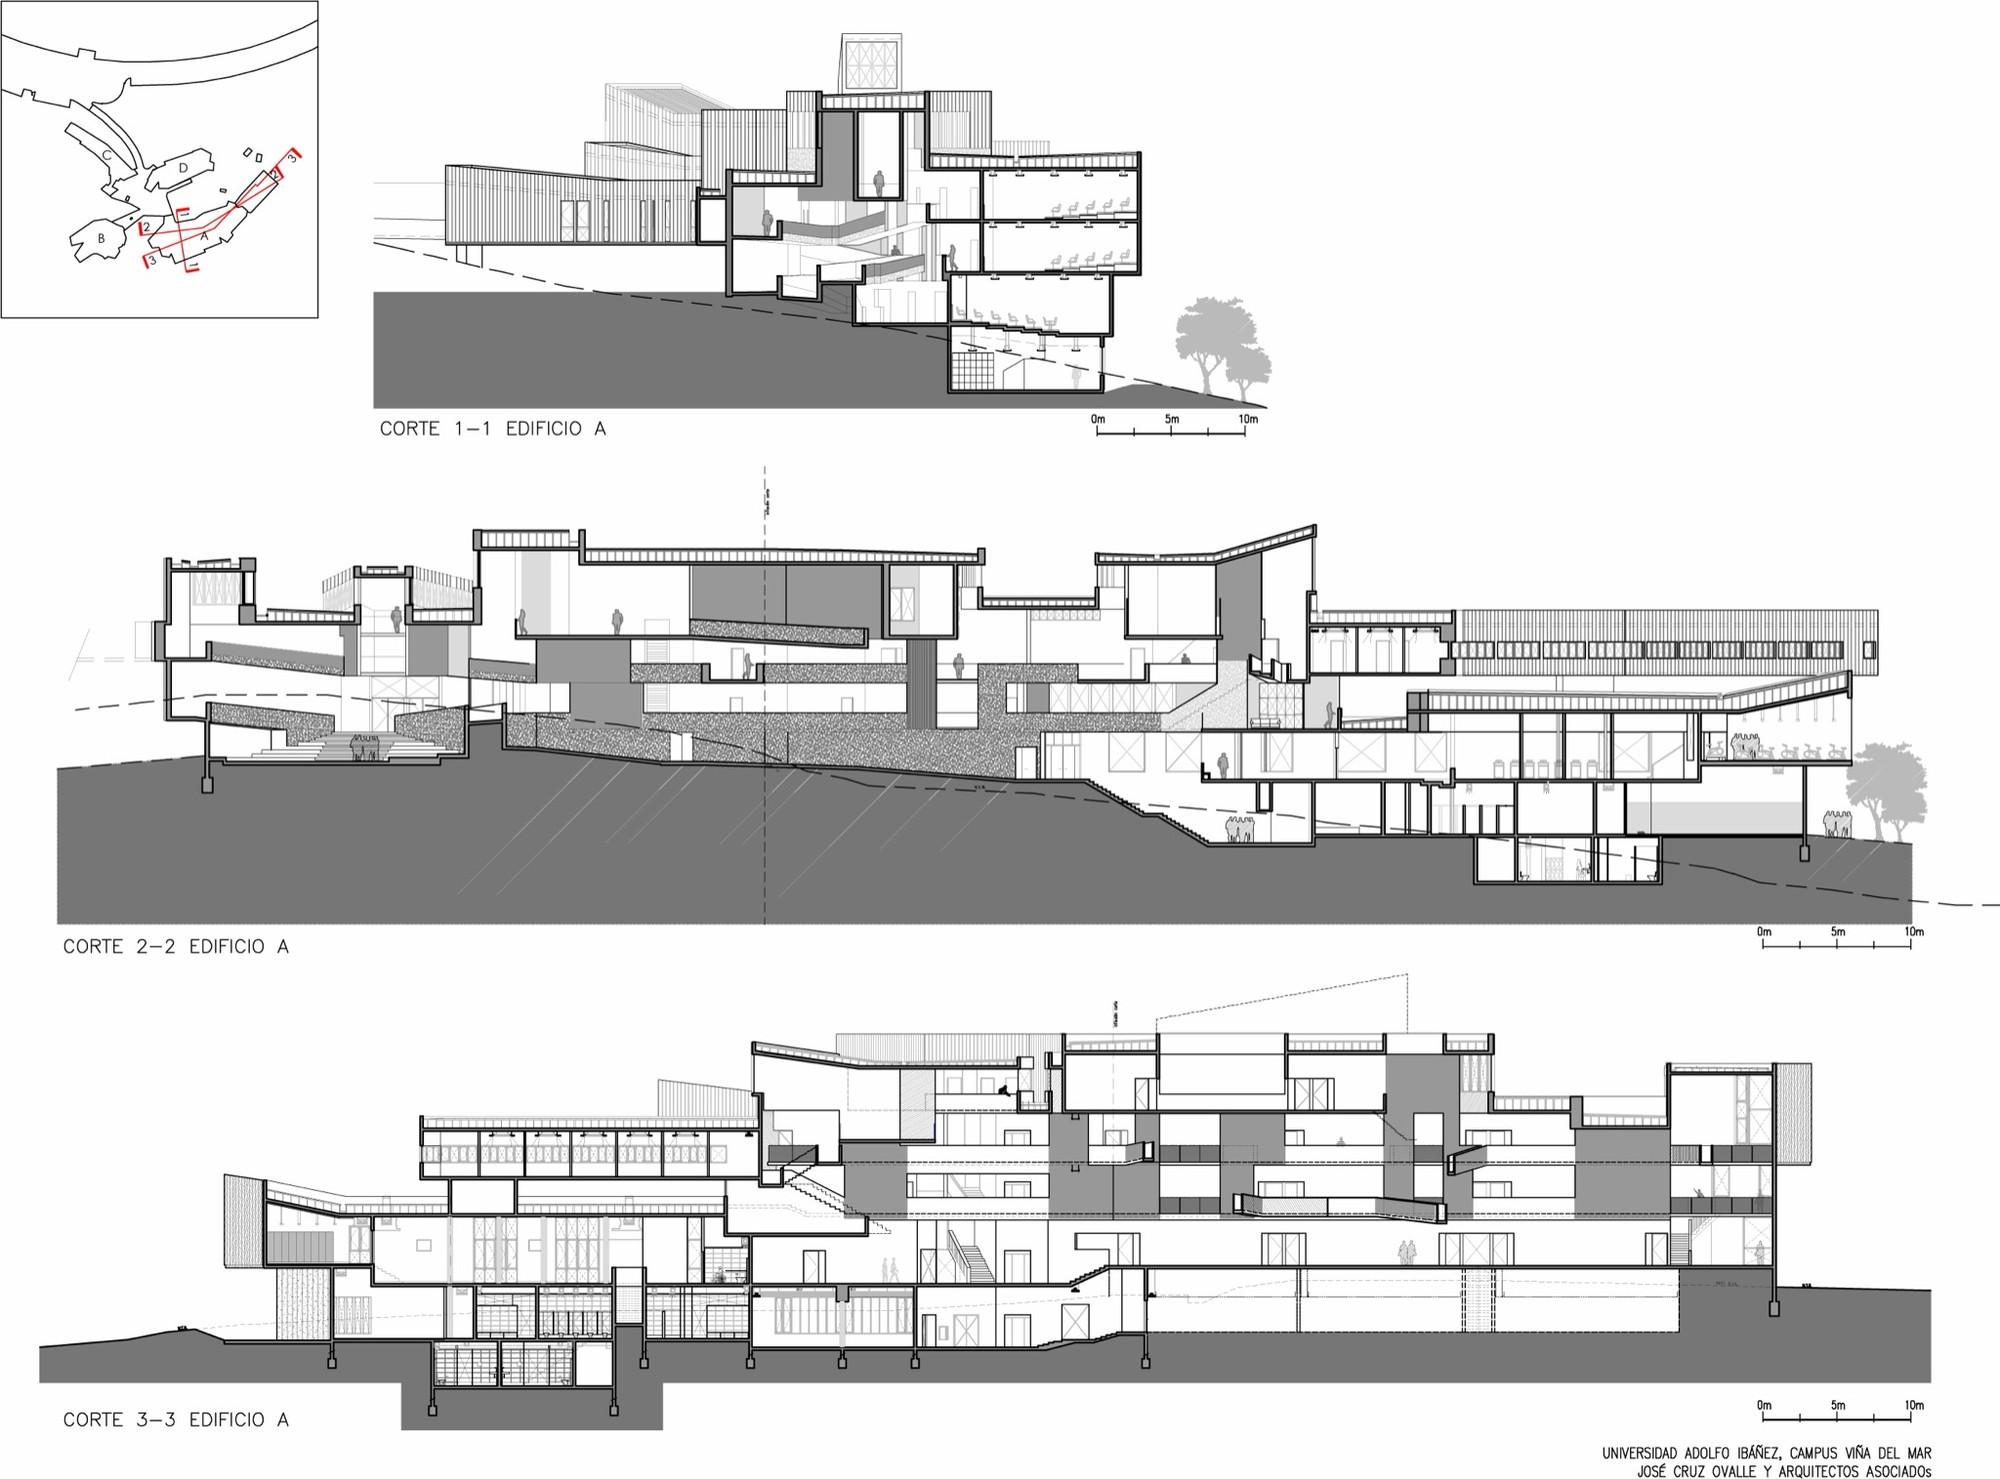 Galer a de arquitectura del campus universidad adolfo for Arquitectura nota de corte